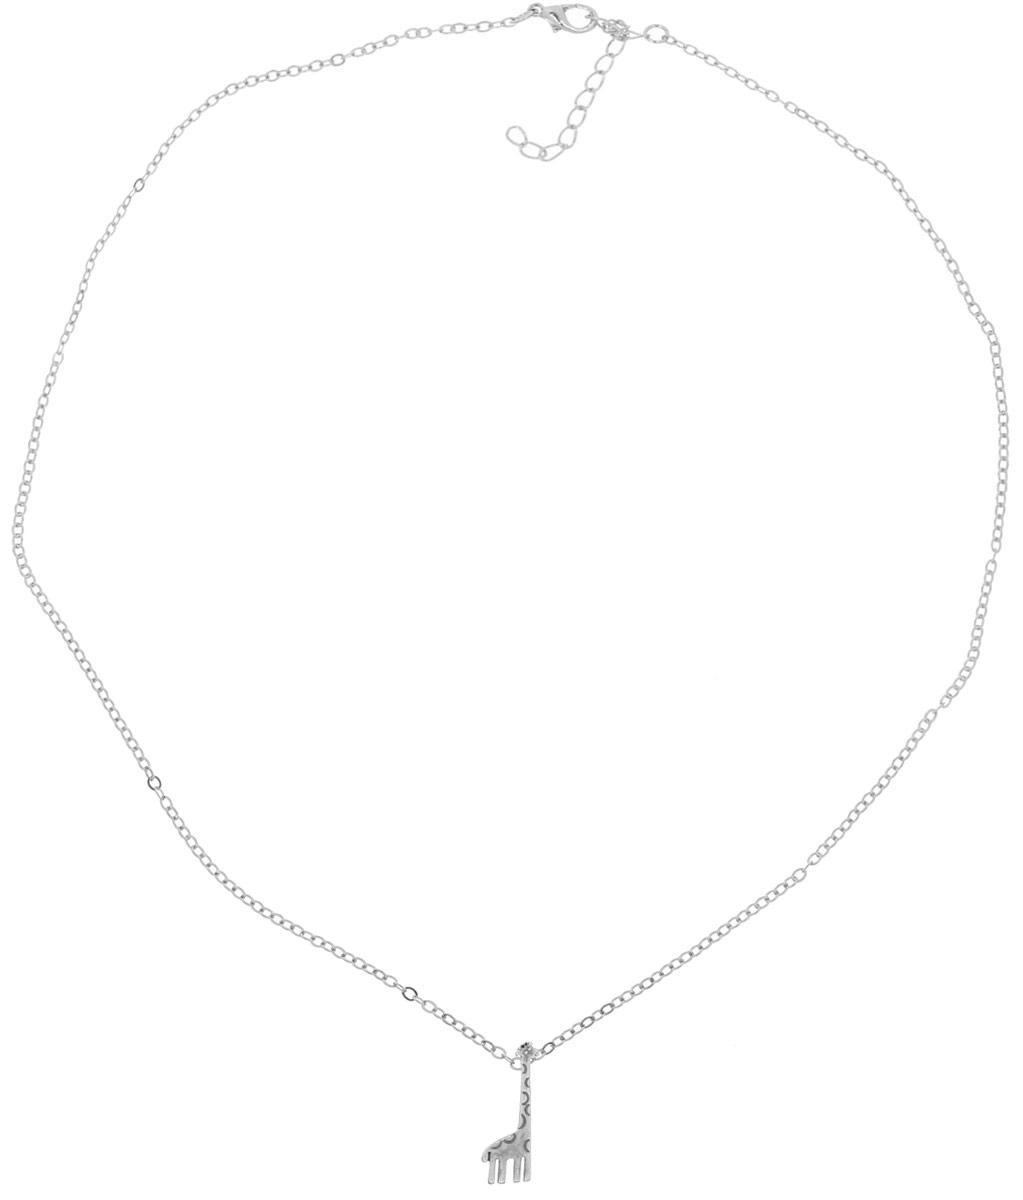 Jenavi, Коллекция Young 2, Цила (Кулон), цвет - сереброf6603990Коллекция Young 2, Цила (Кулон) гипоаллергенный ювелирный сплав,Черненое серебро, вставка без вставок, цвет - серебро